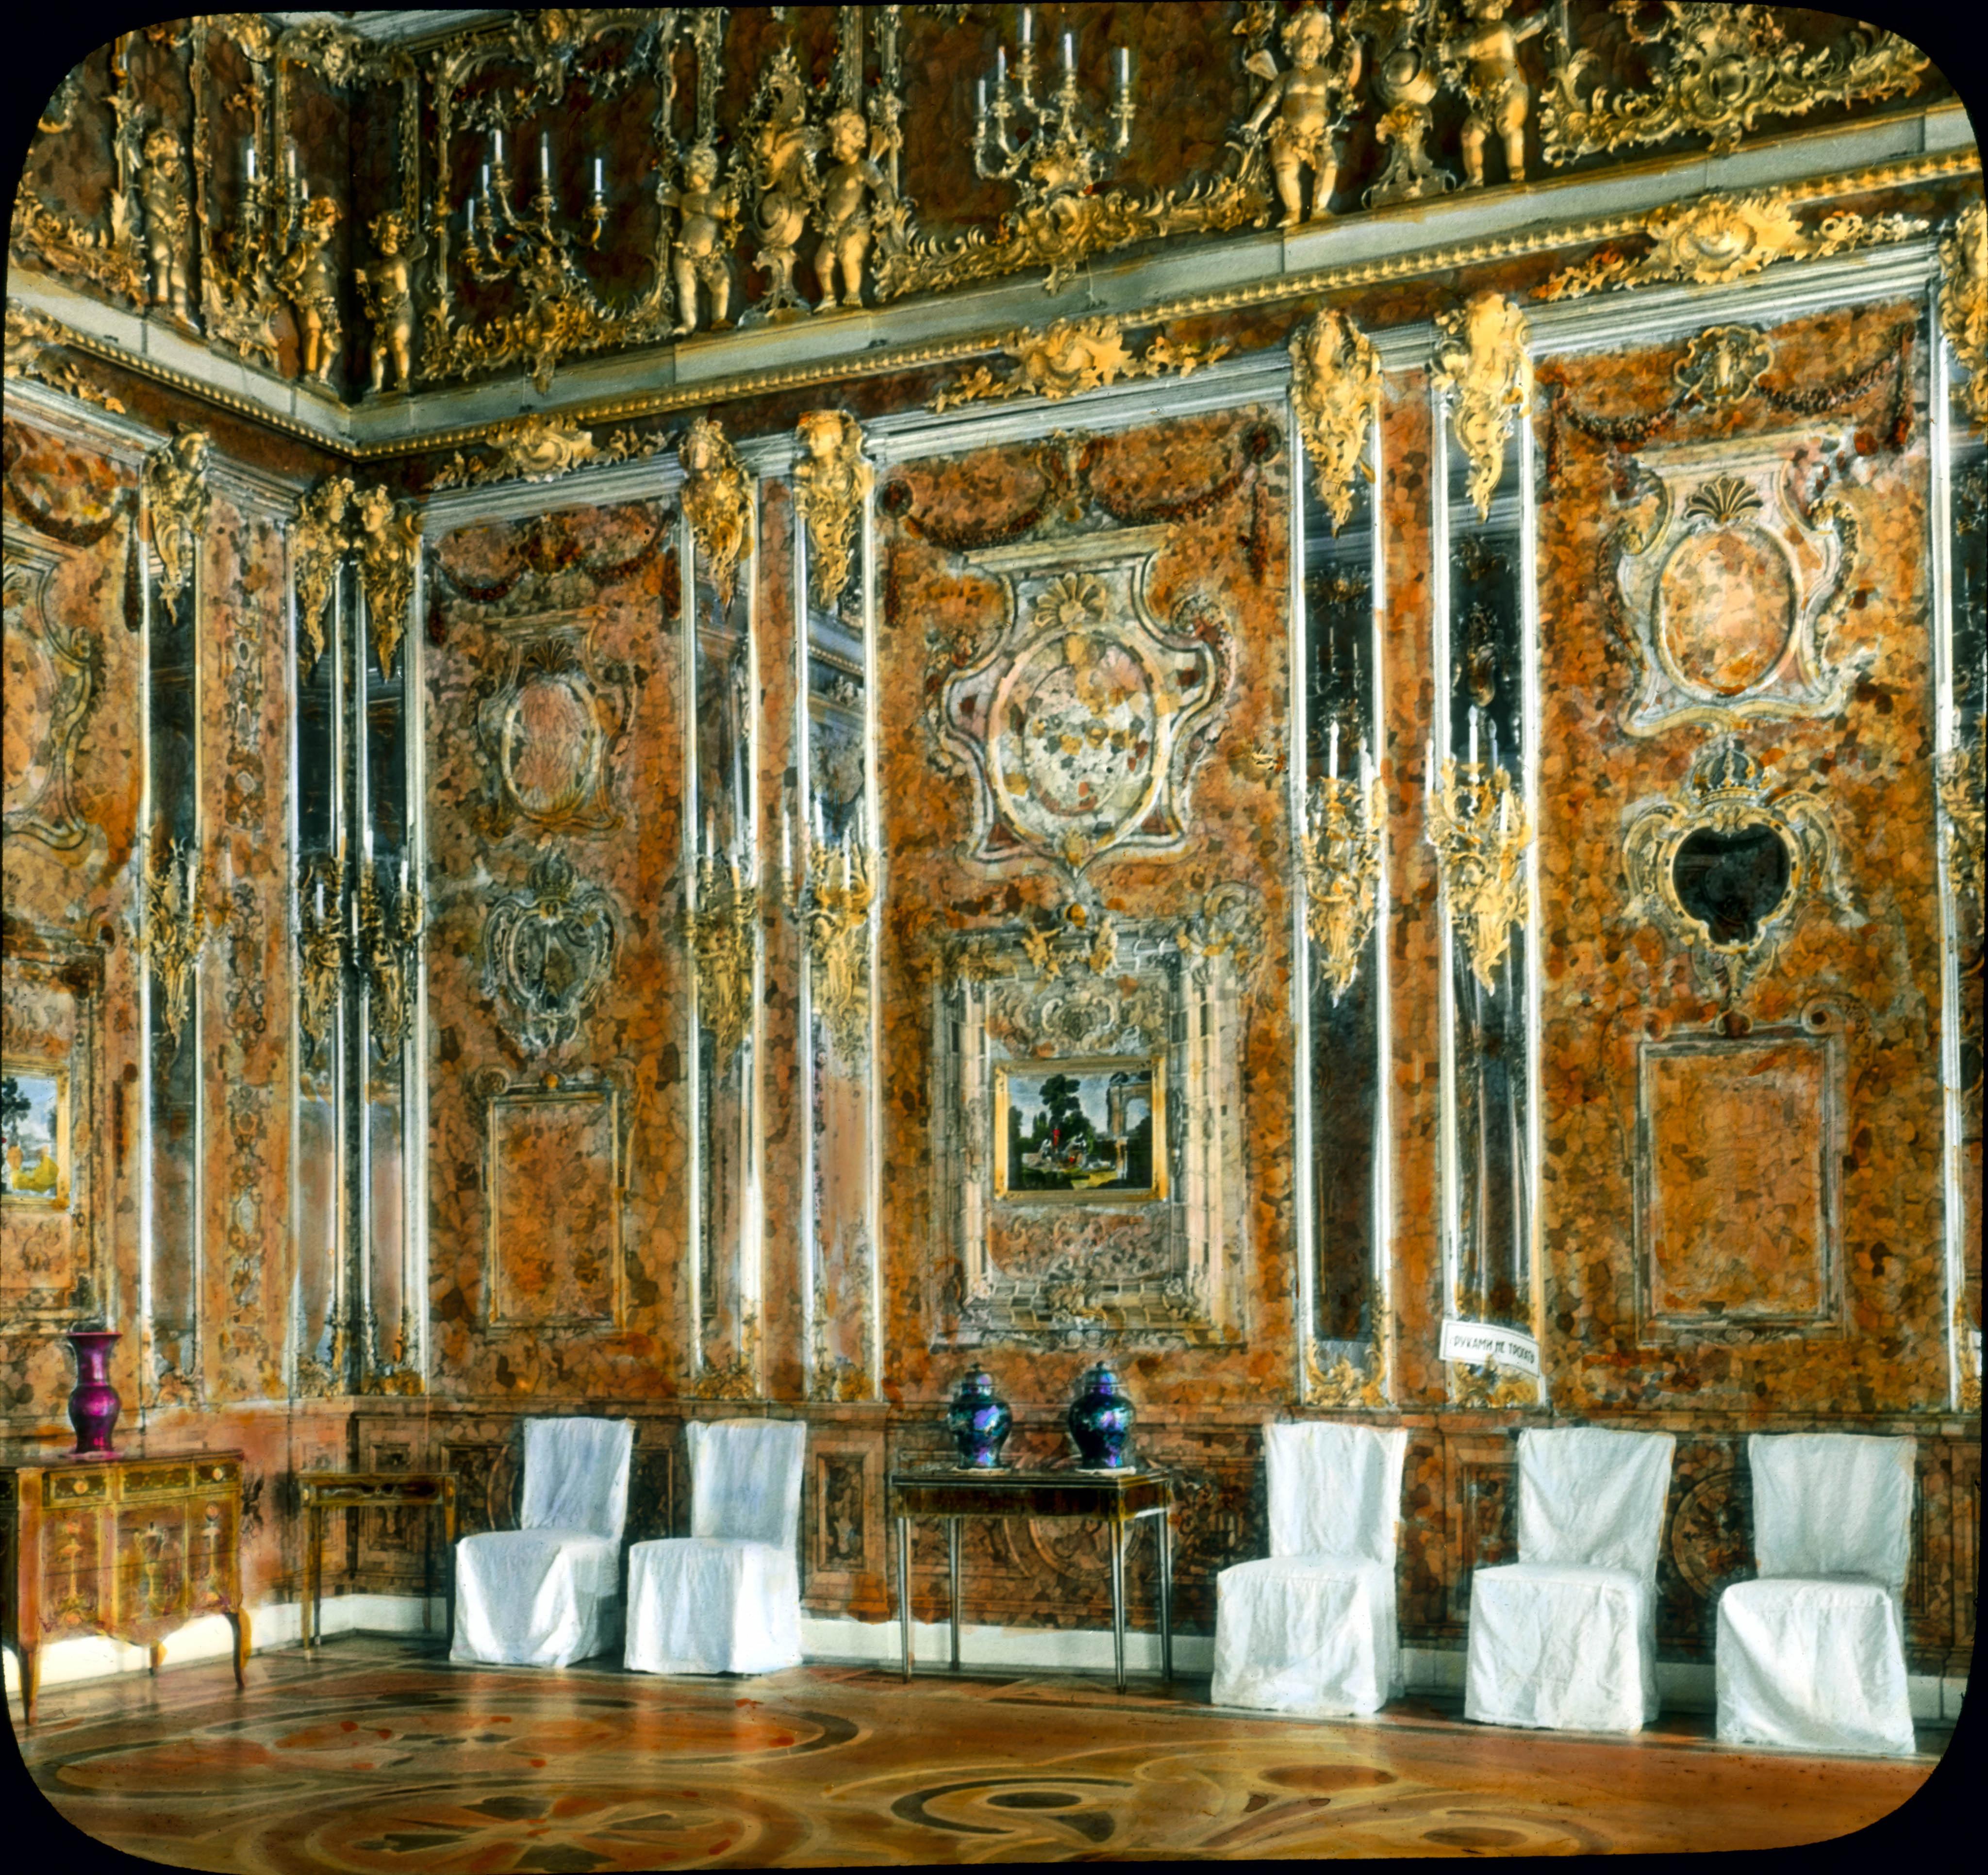 File:Catherine Palace interior - Amber Room (2).jpg - Wikimedia Commons